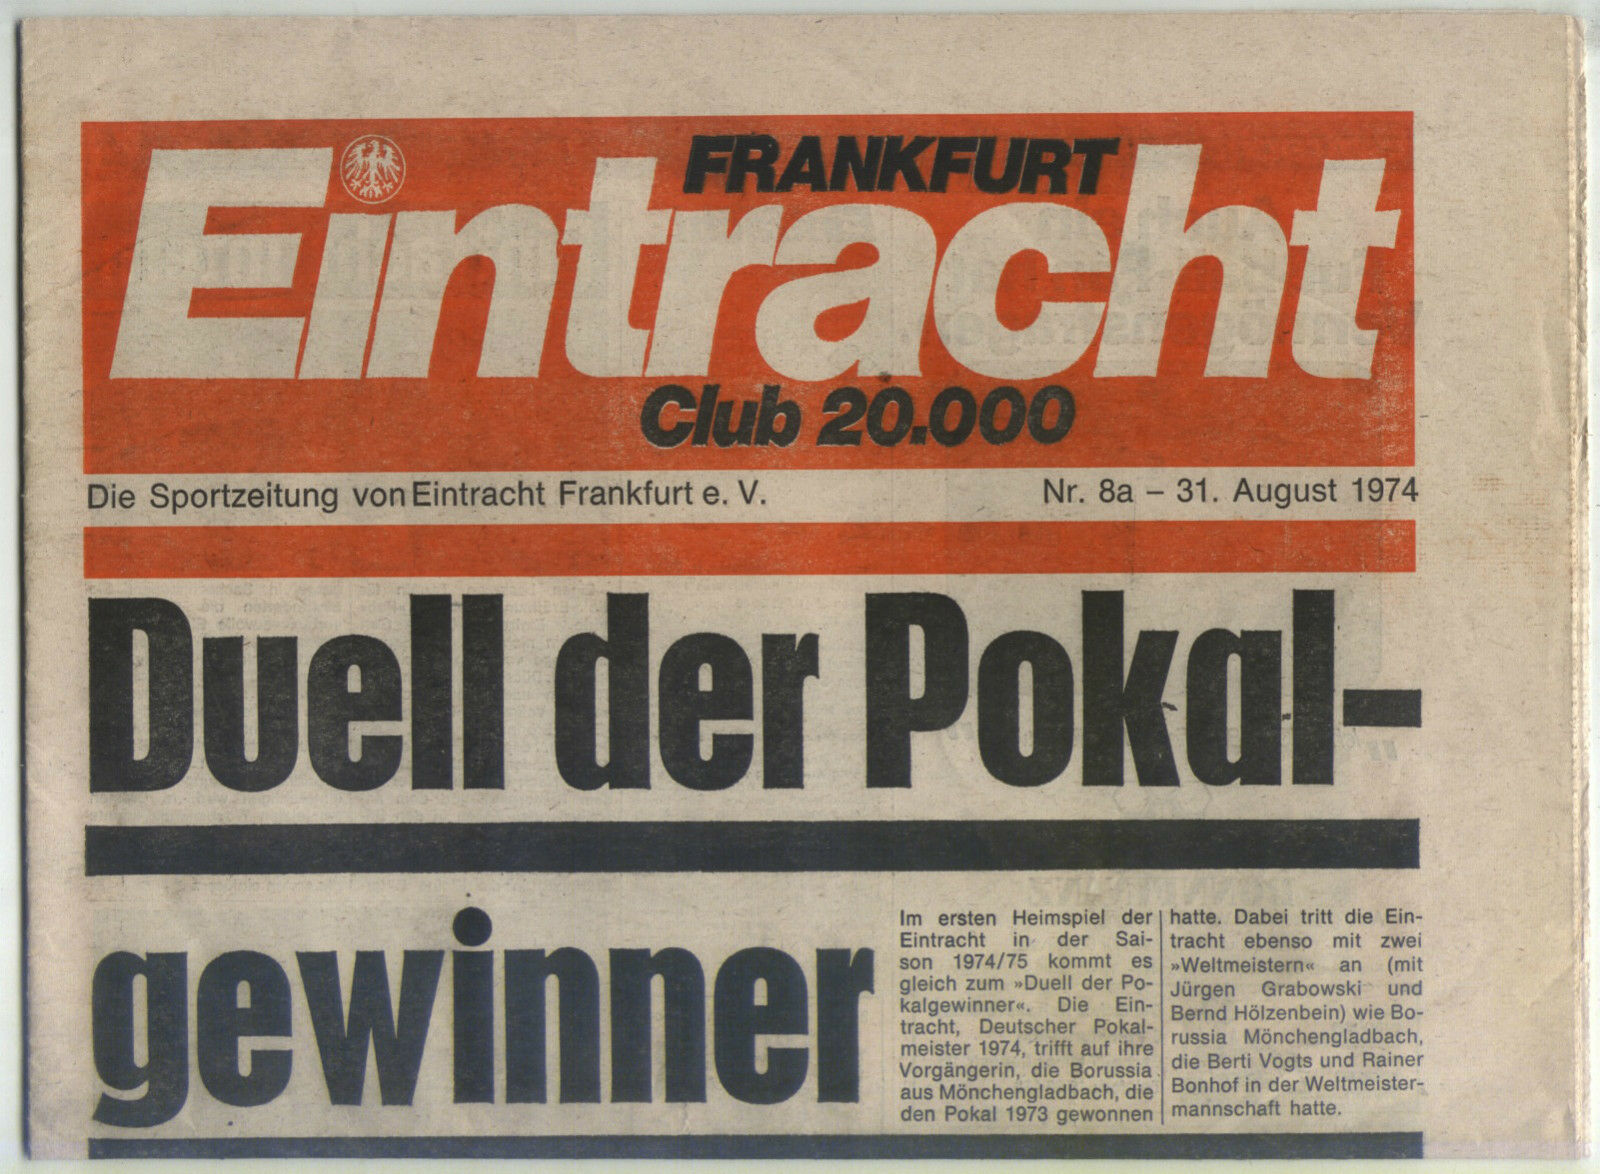 BL 74 75 Eintracht Francoforte - Borussia Mönchengladbach (31.08.1974)